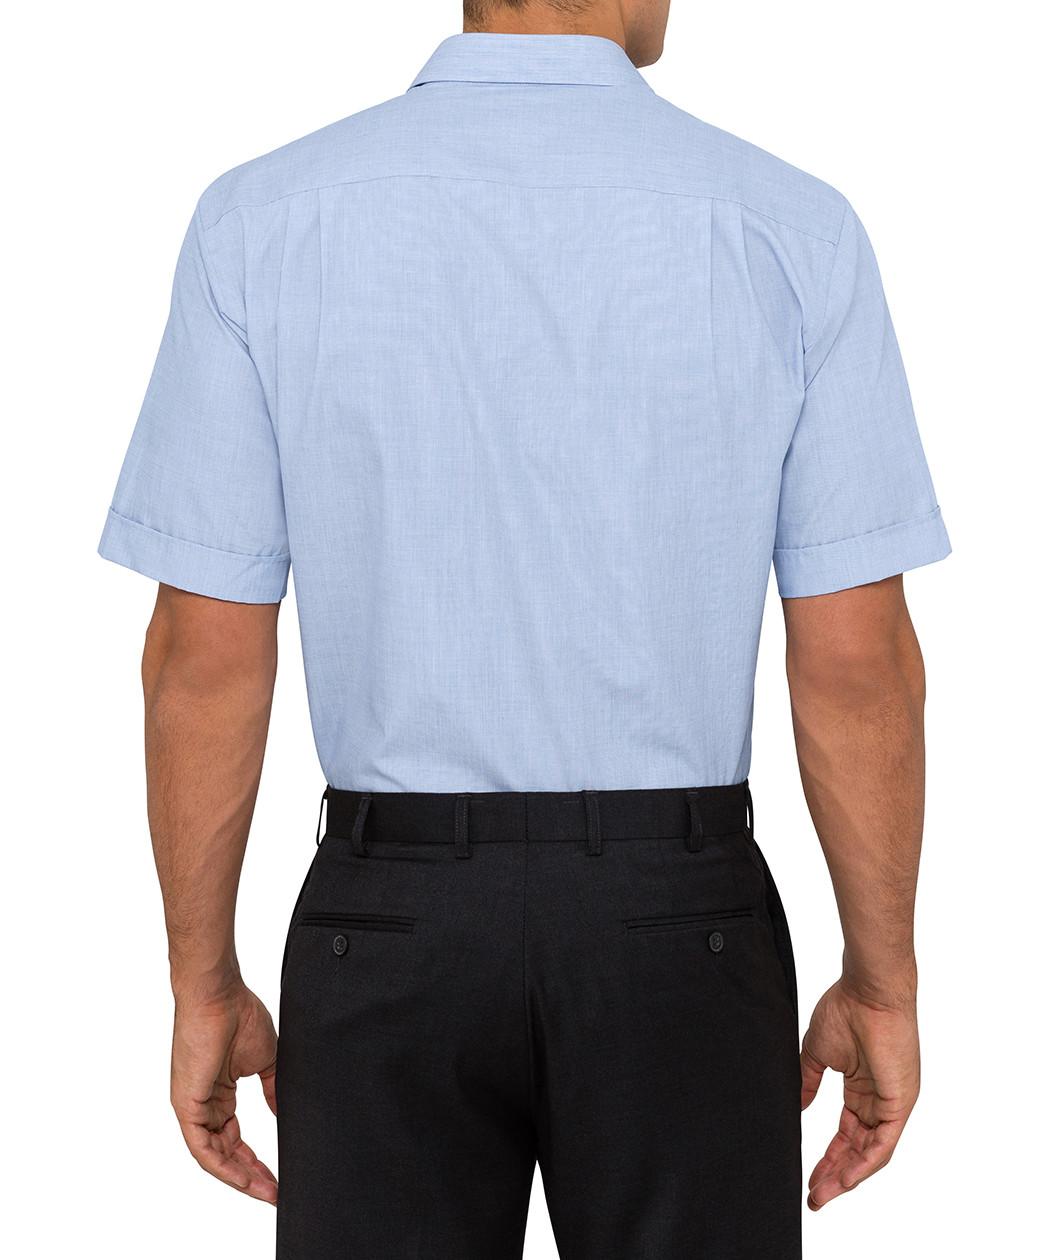 Van Heusen  Mens Clothing Online  Menswear Online